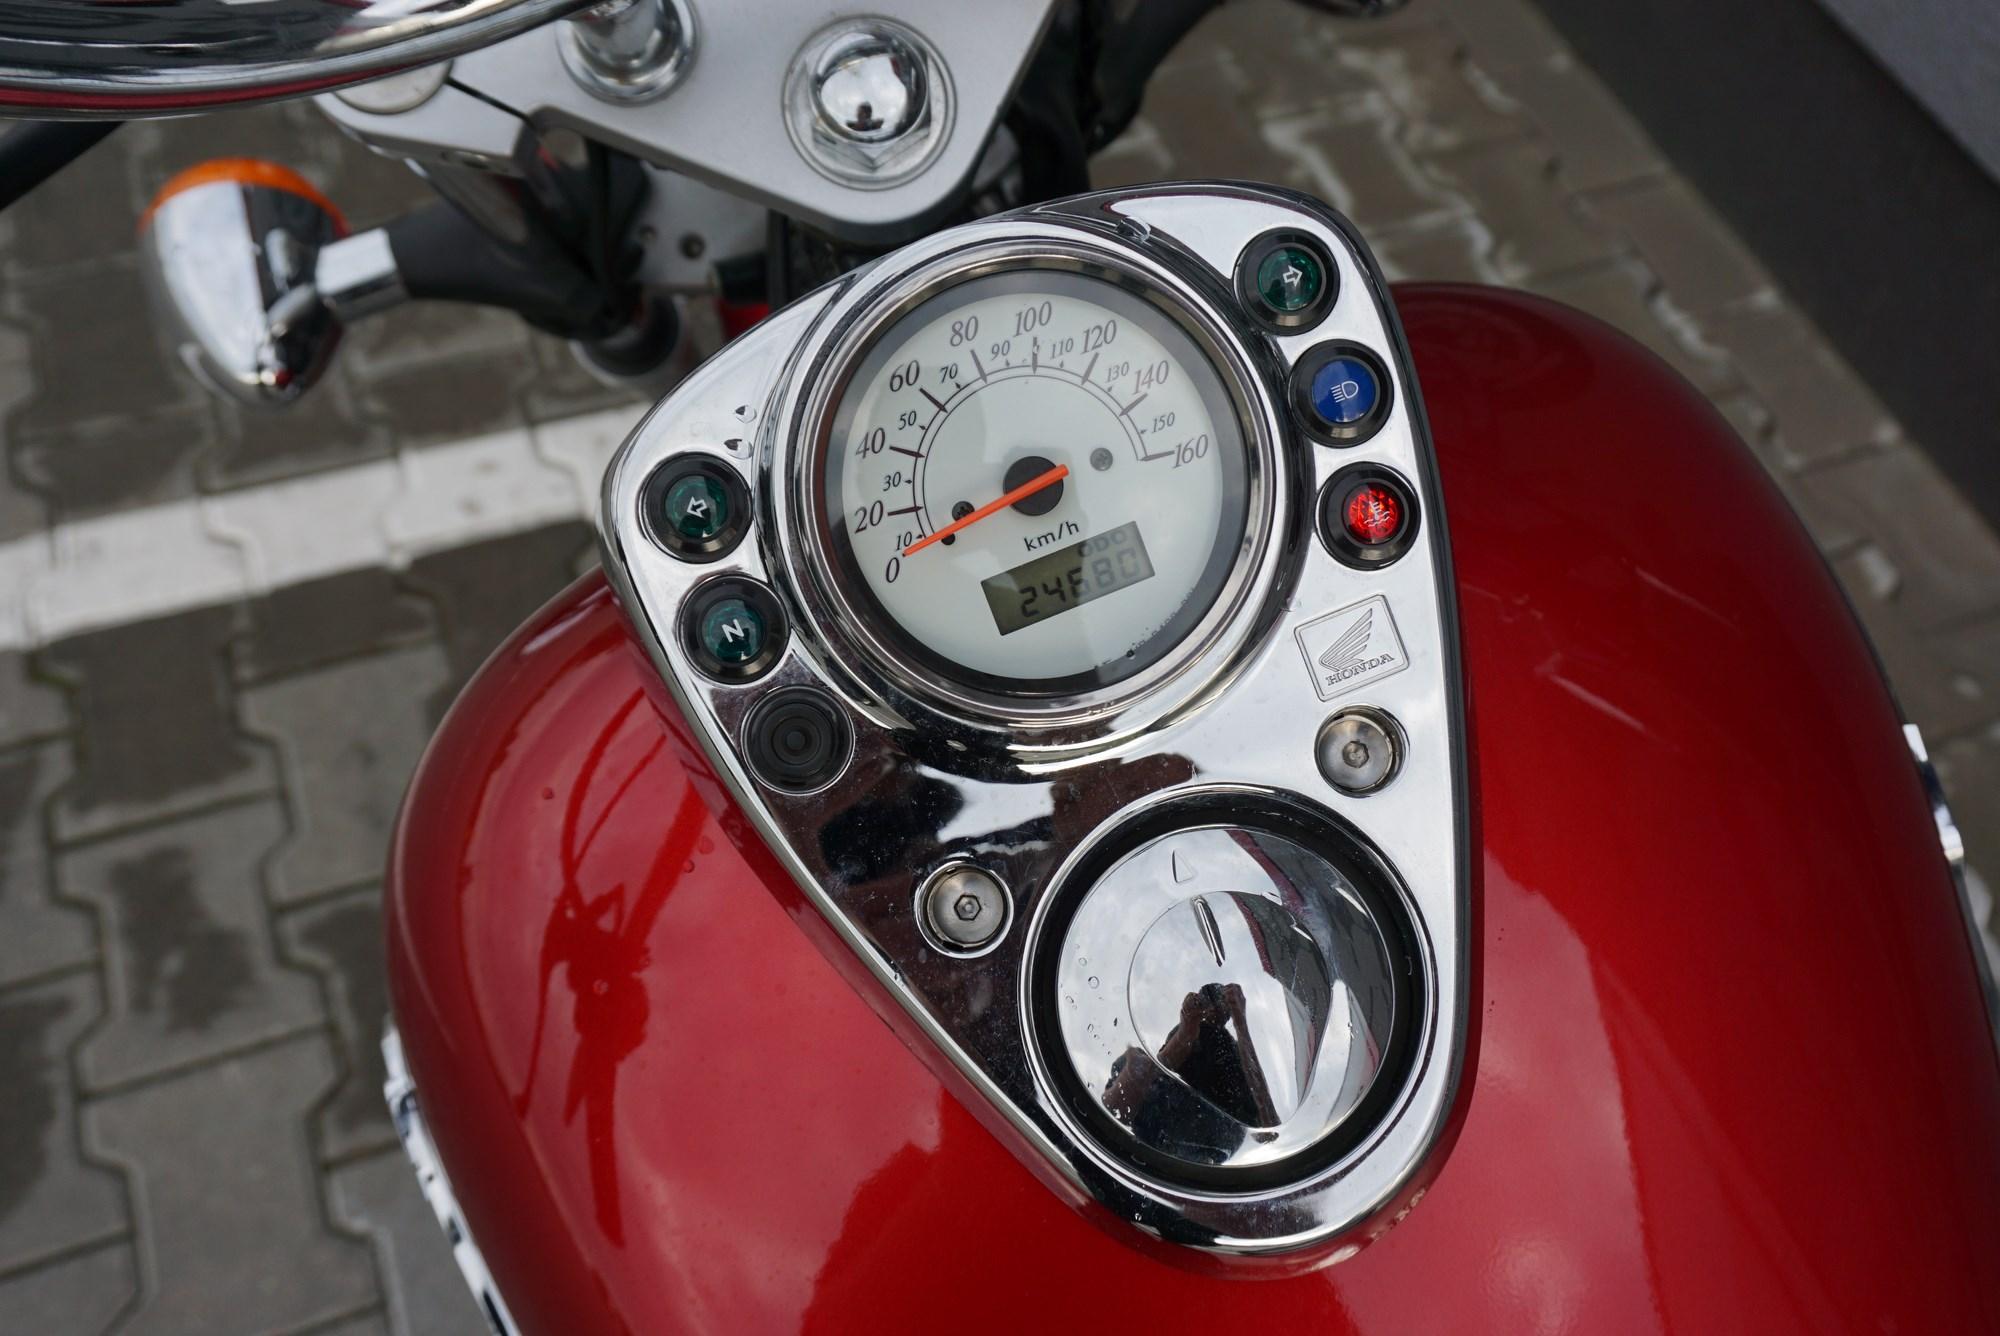 Honda Shadow 125